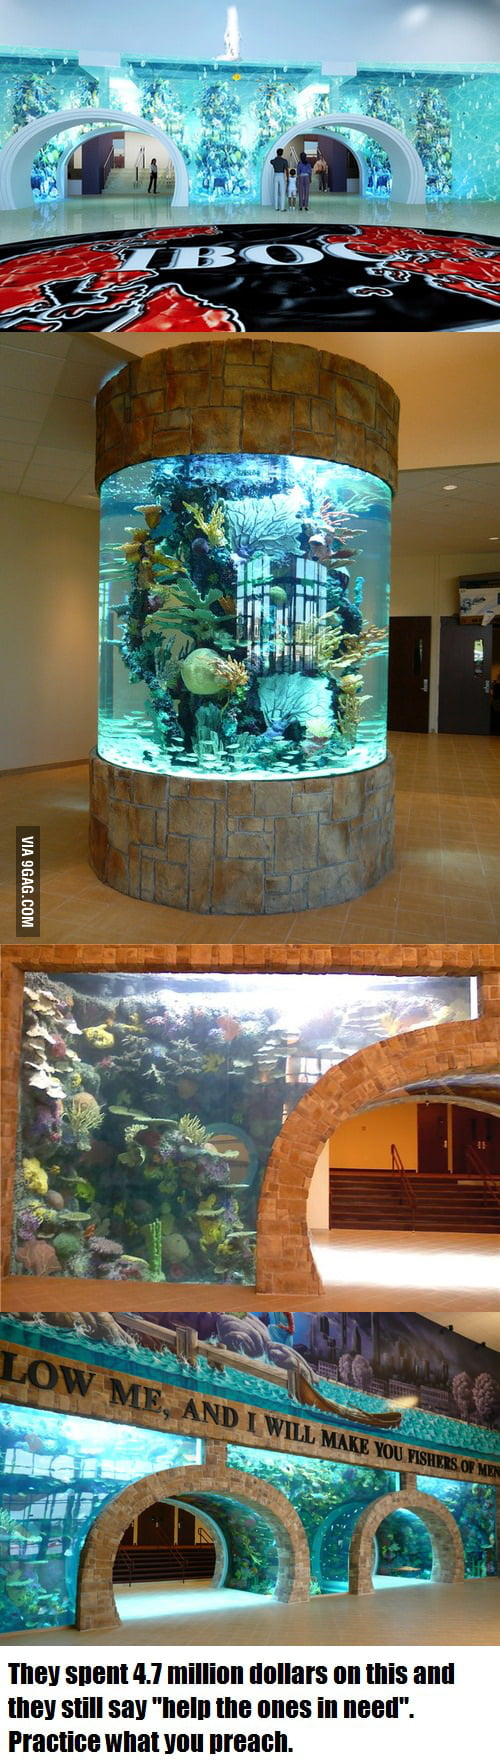 Freshwater aquarium fish dallas - An Evangelical Church In Dallas Bought This Fish Aquarium